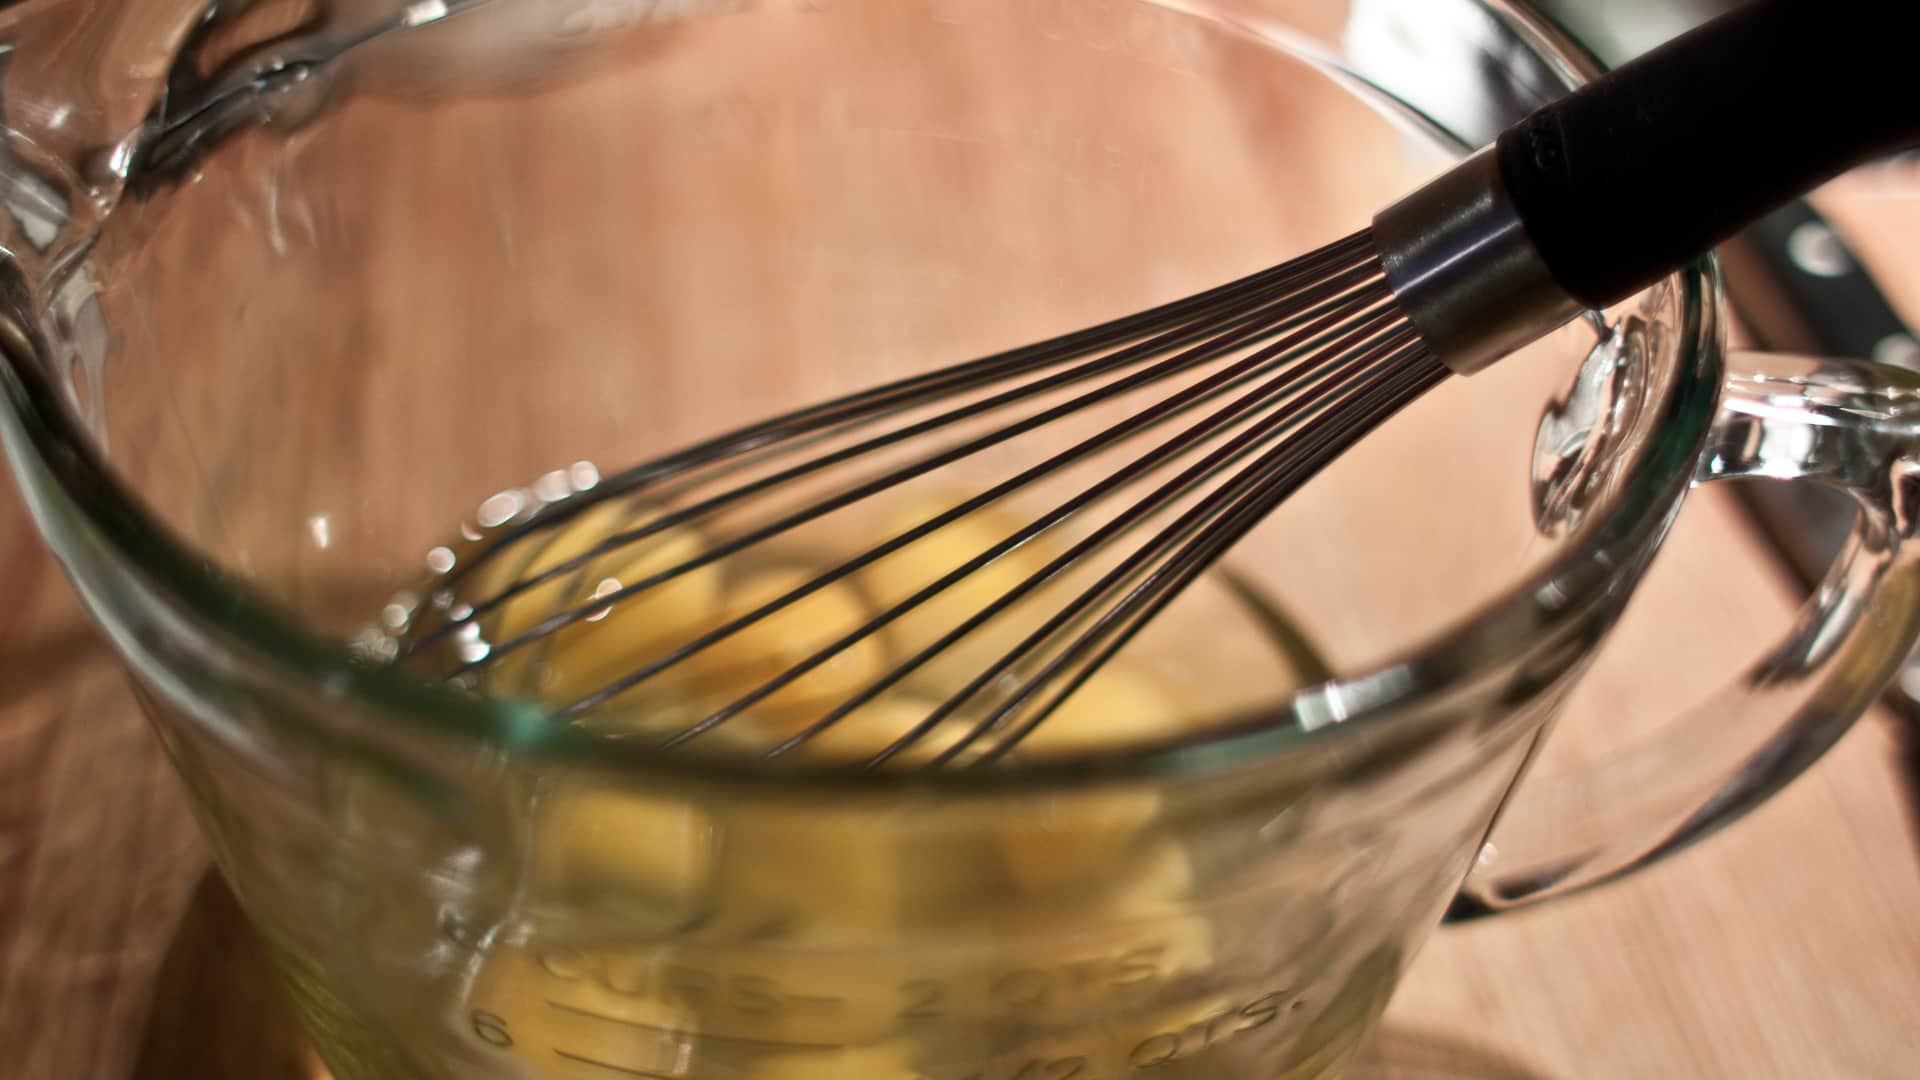 Battre les œufs en omelette